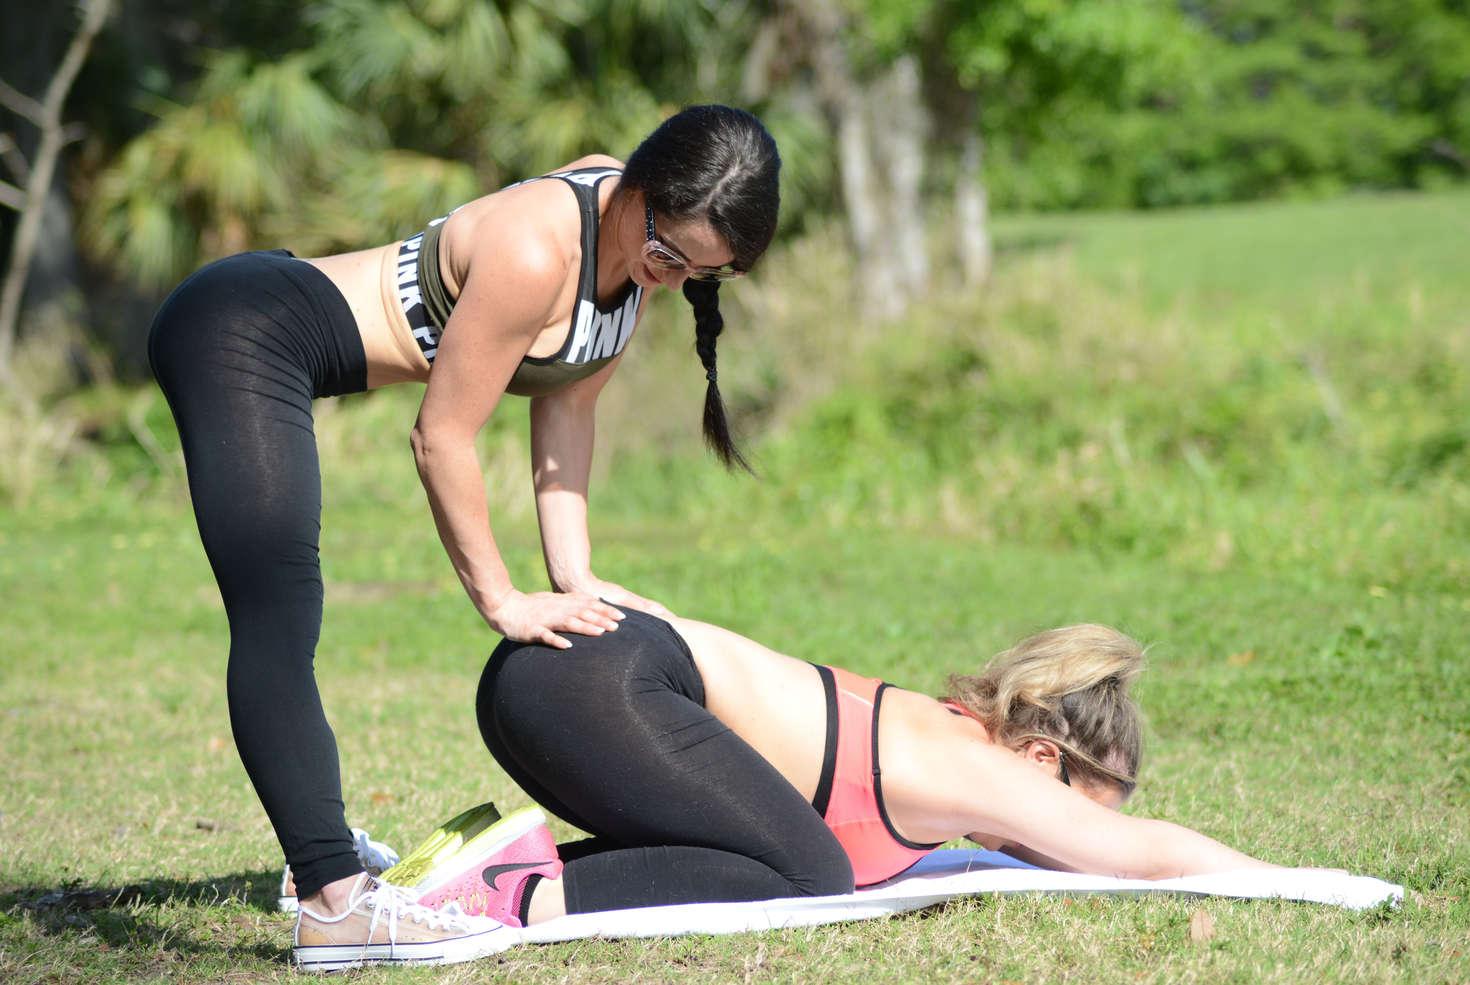 Carmen valentina and cleo doing yoga at a park 06 gotceleb for Cleo miami